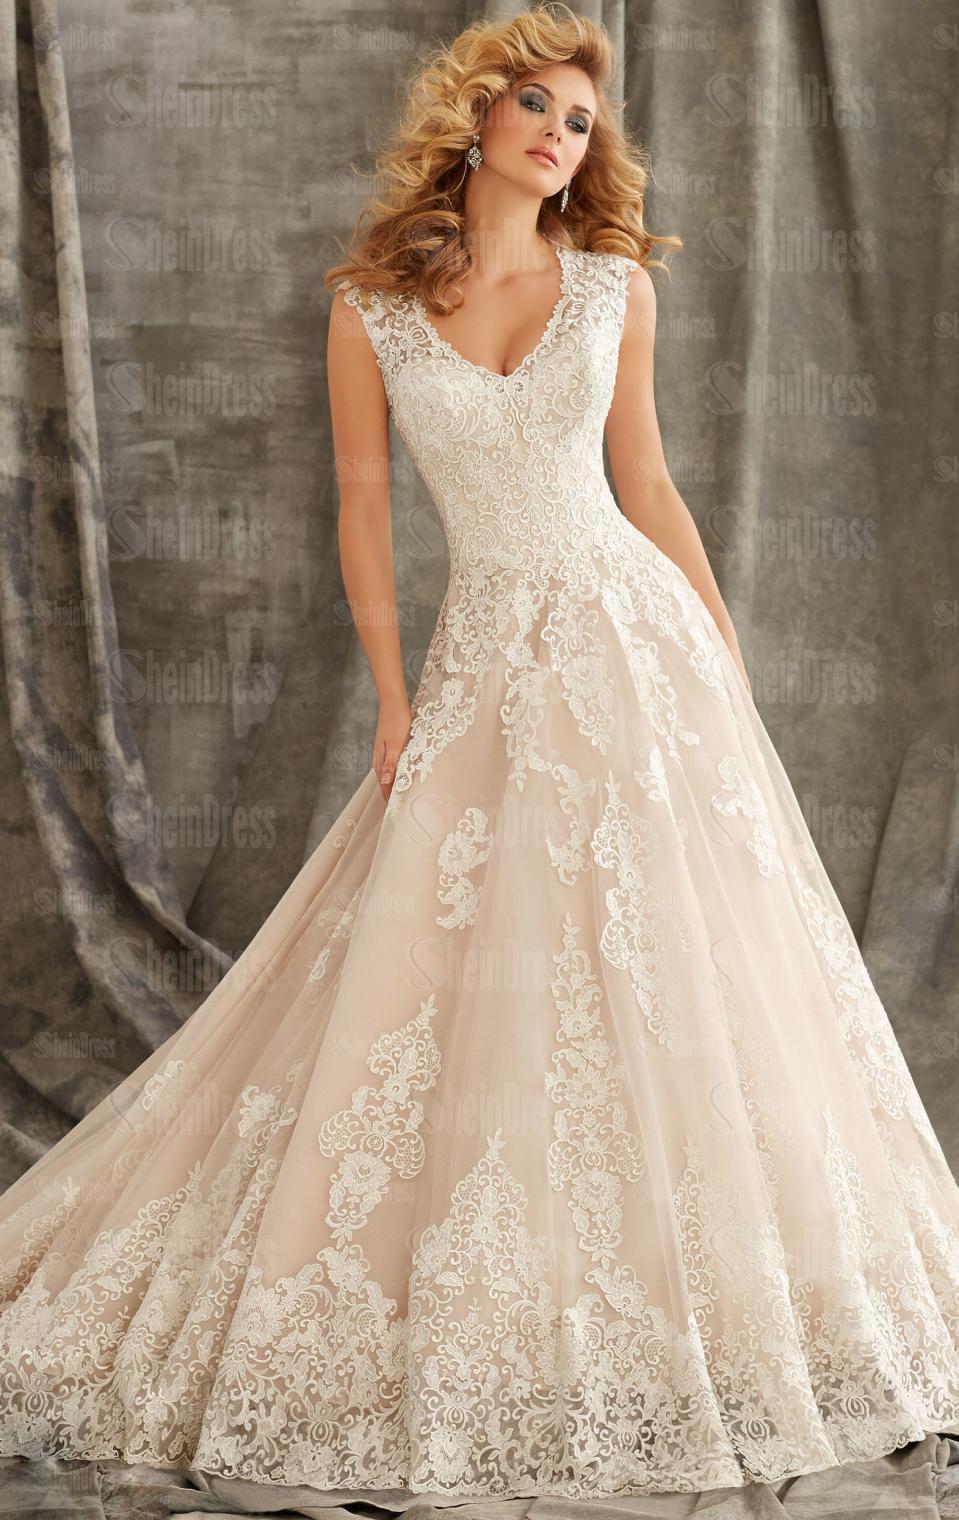 vintage princess wedding dresses photo - 1